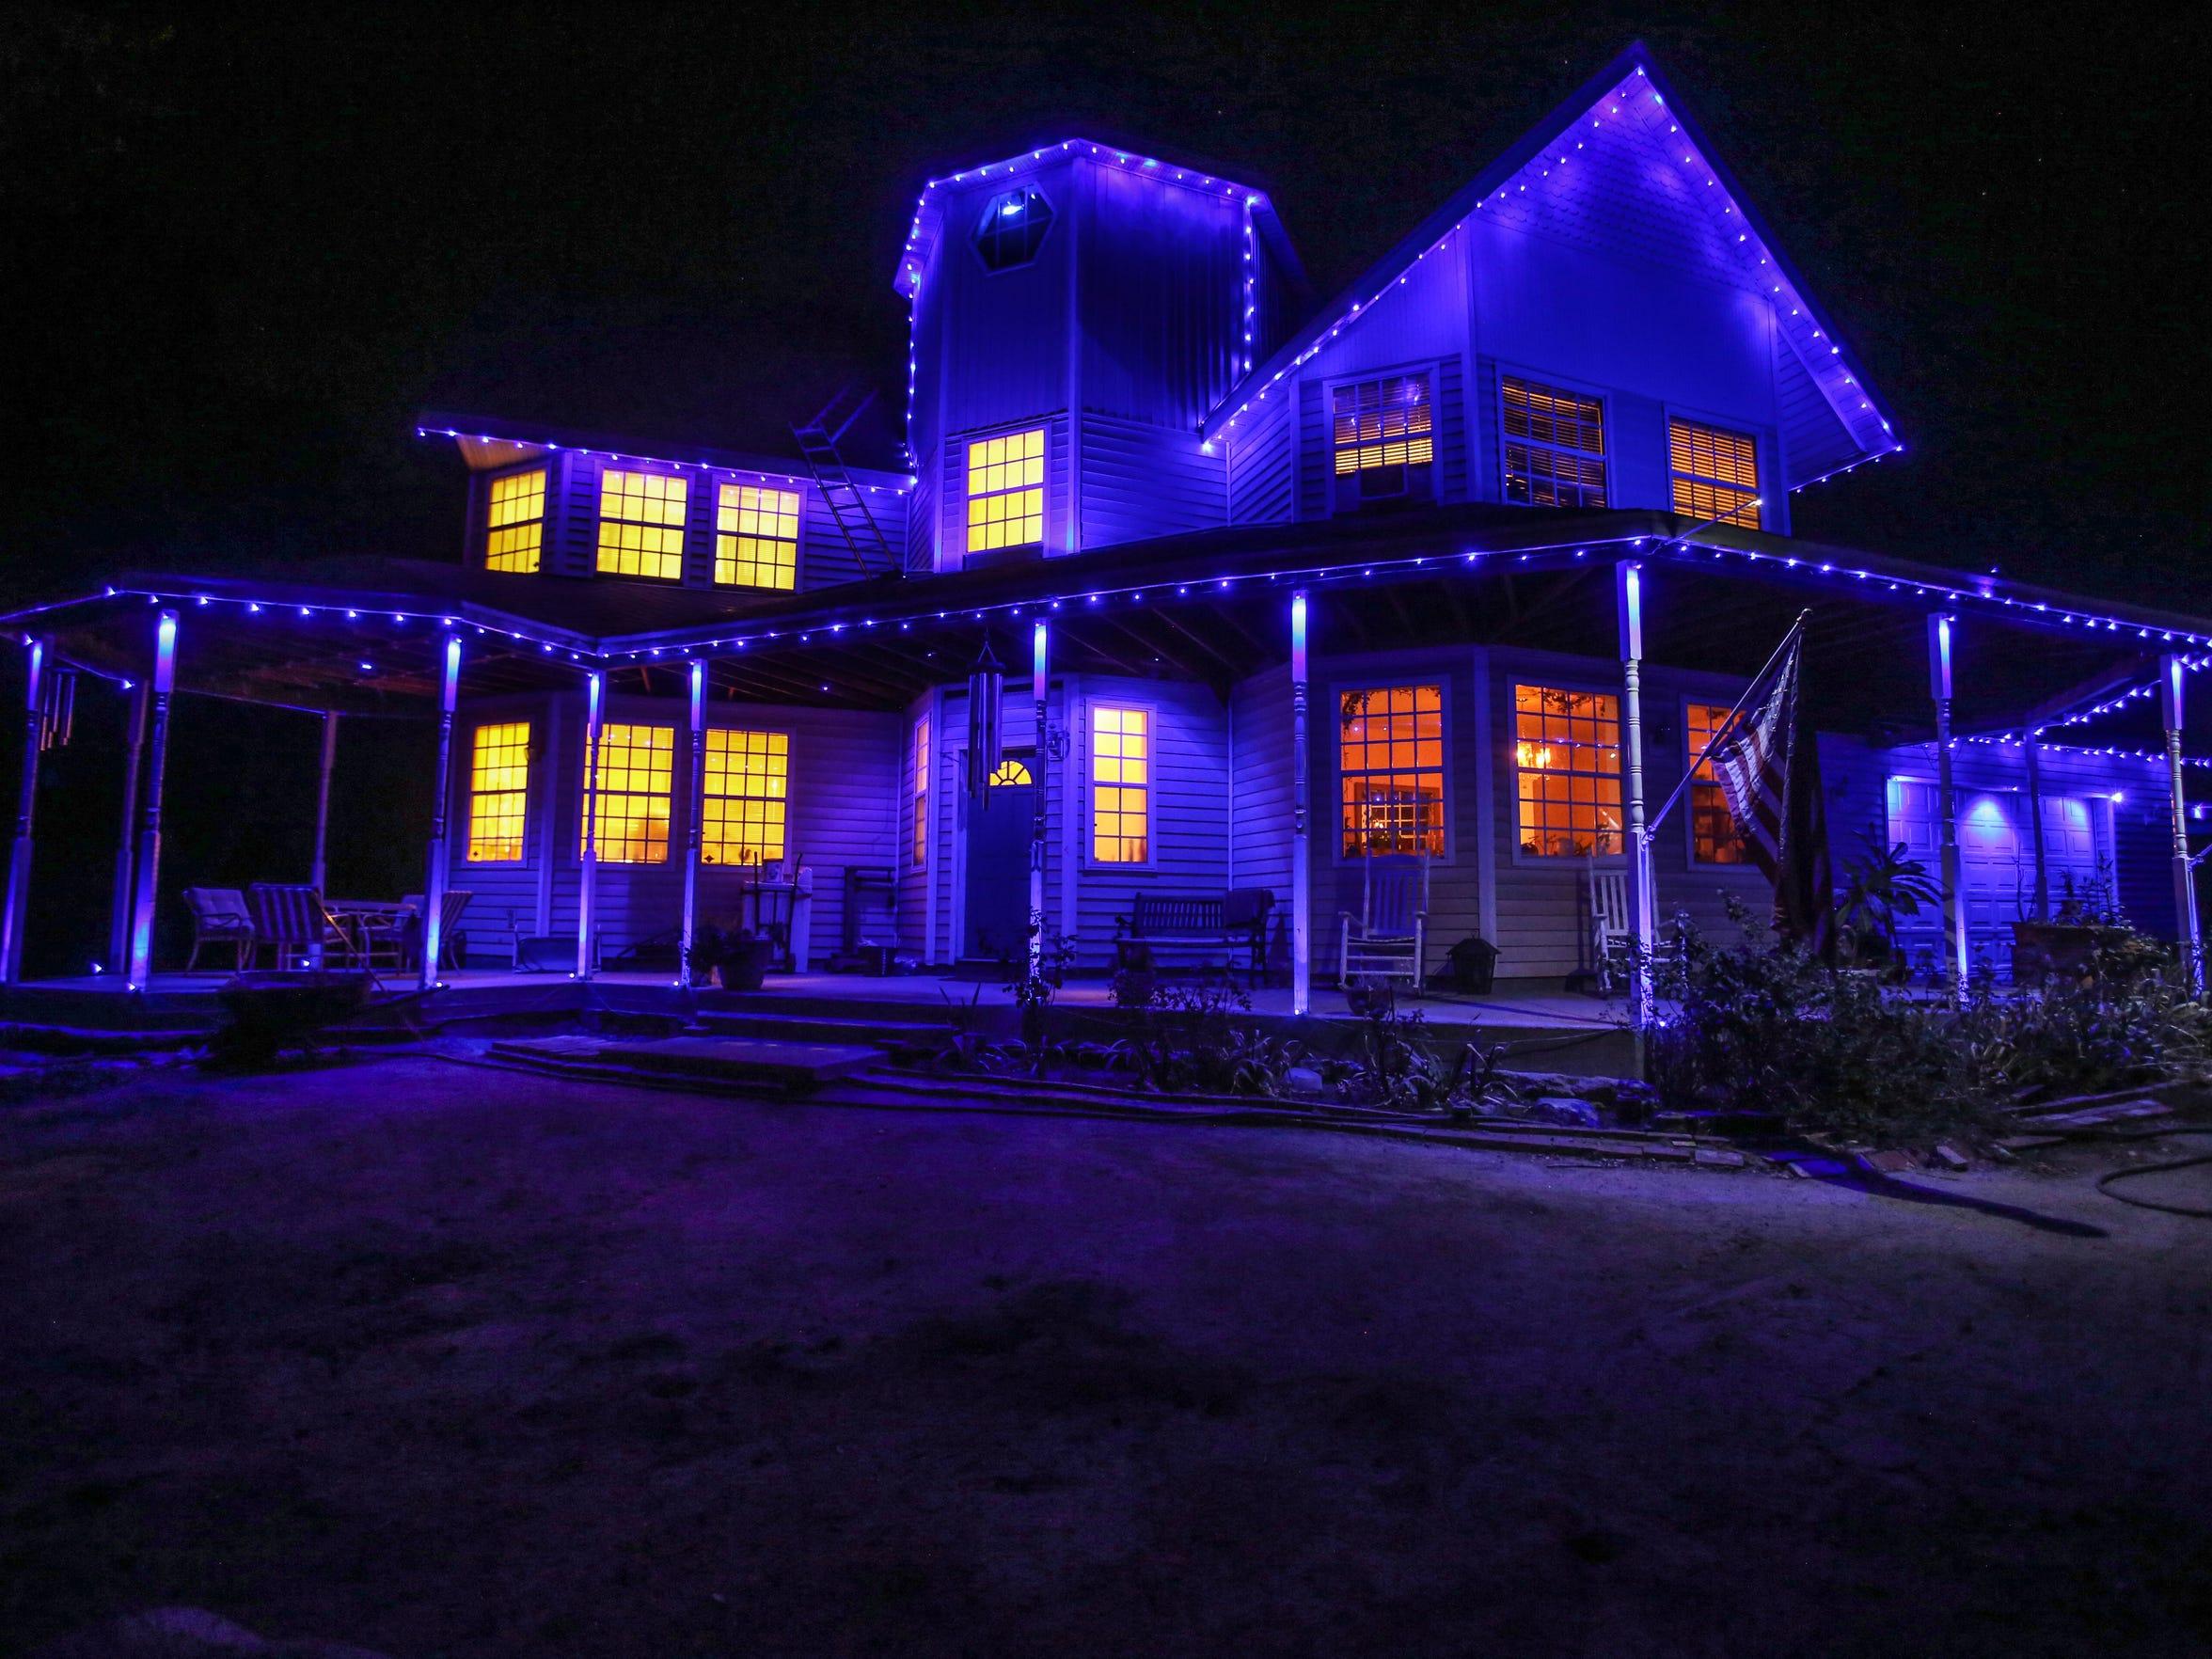 David Kling lights his Hemet house in blue every night